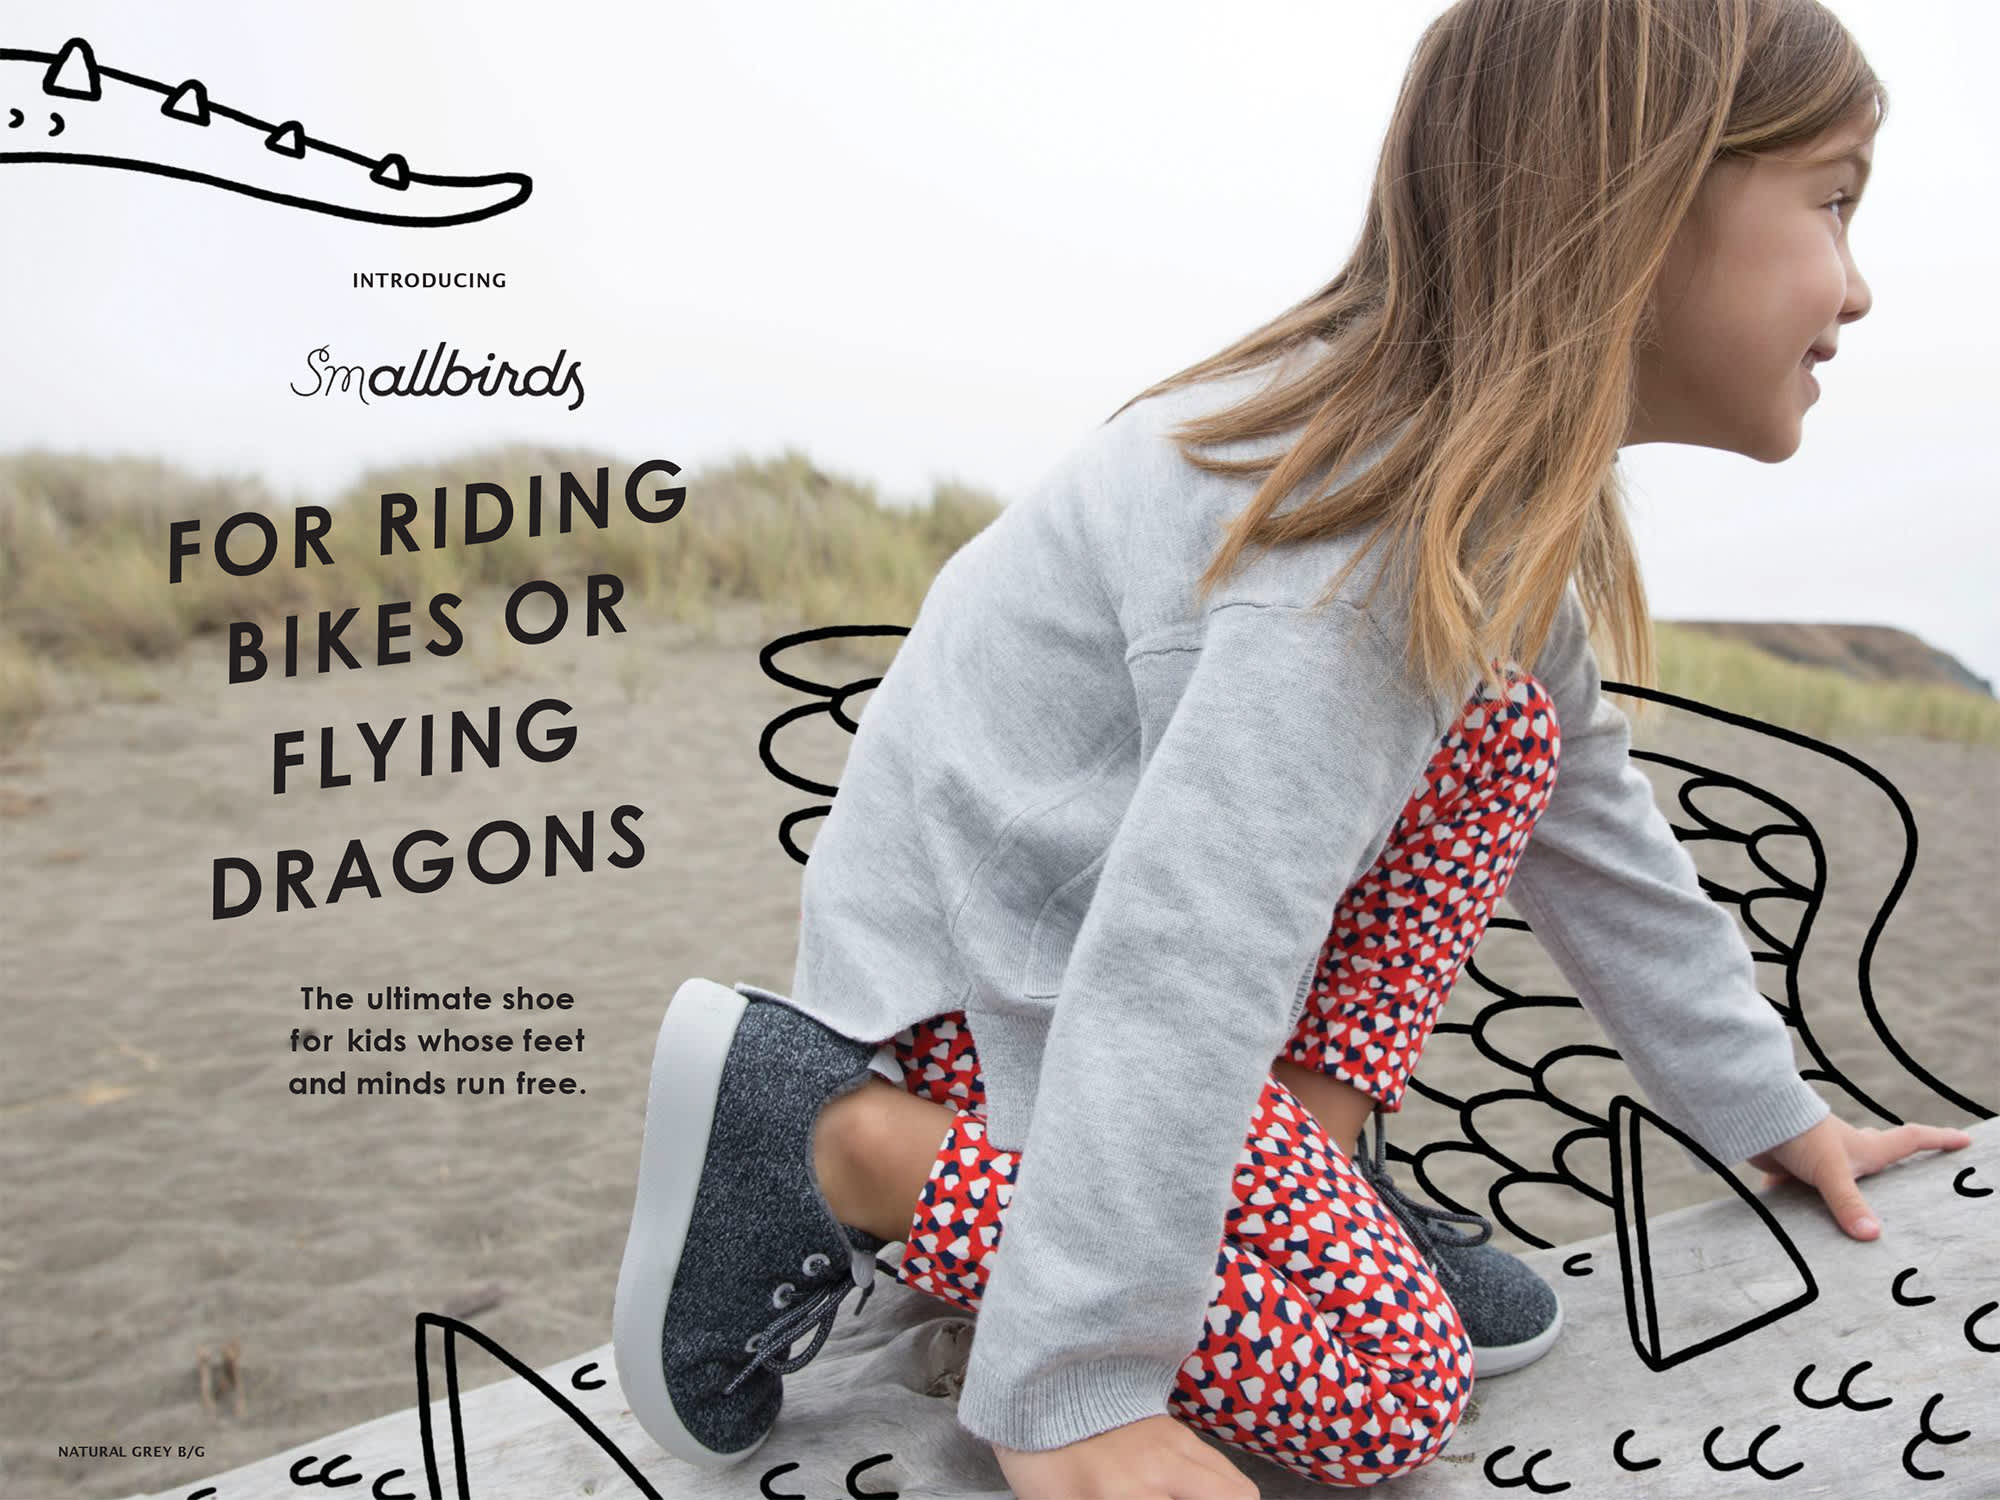 Allbirds launches a shoe line for kids